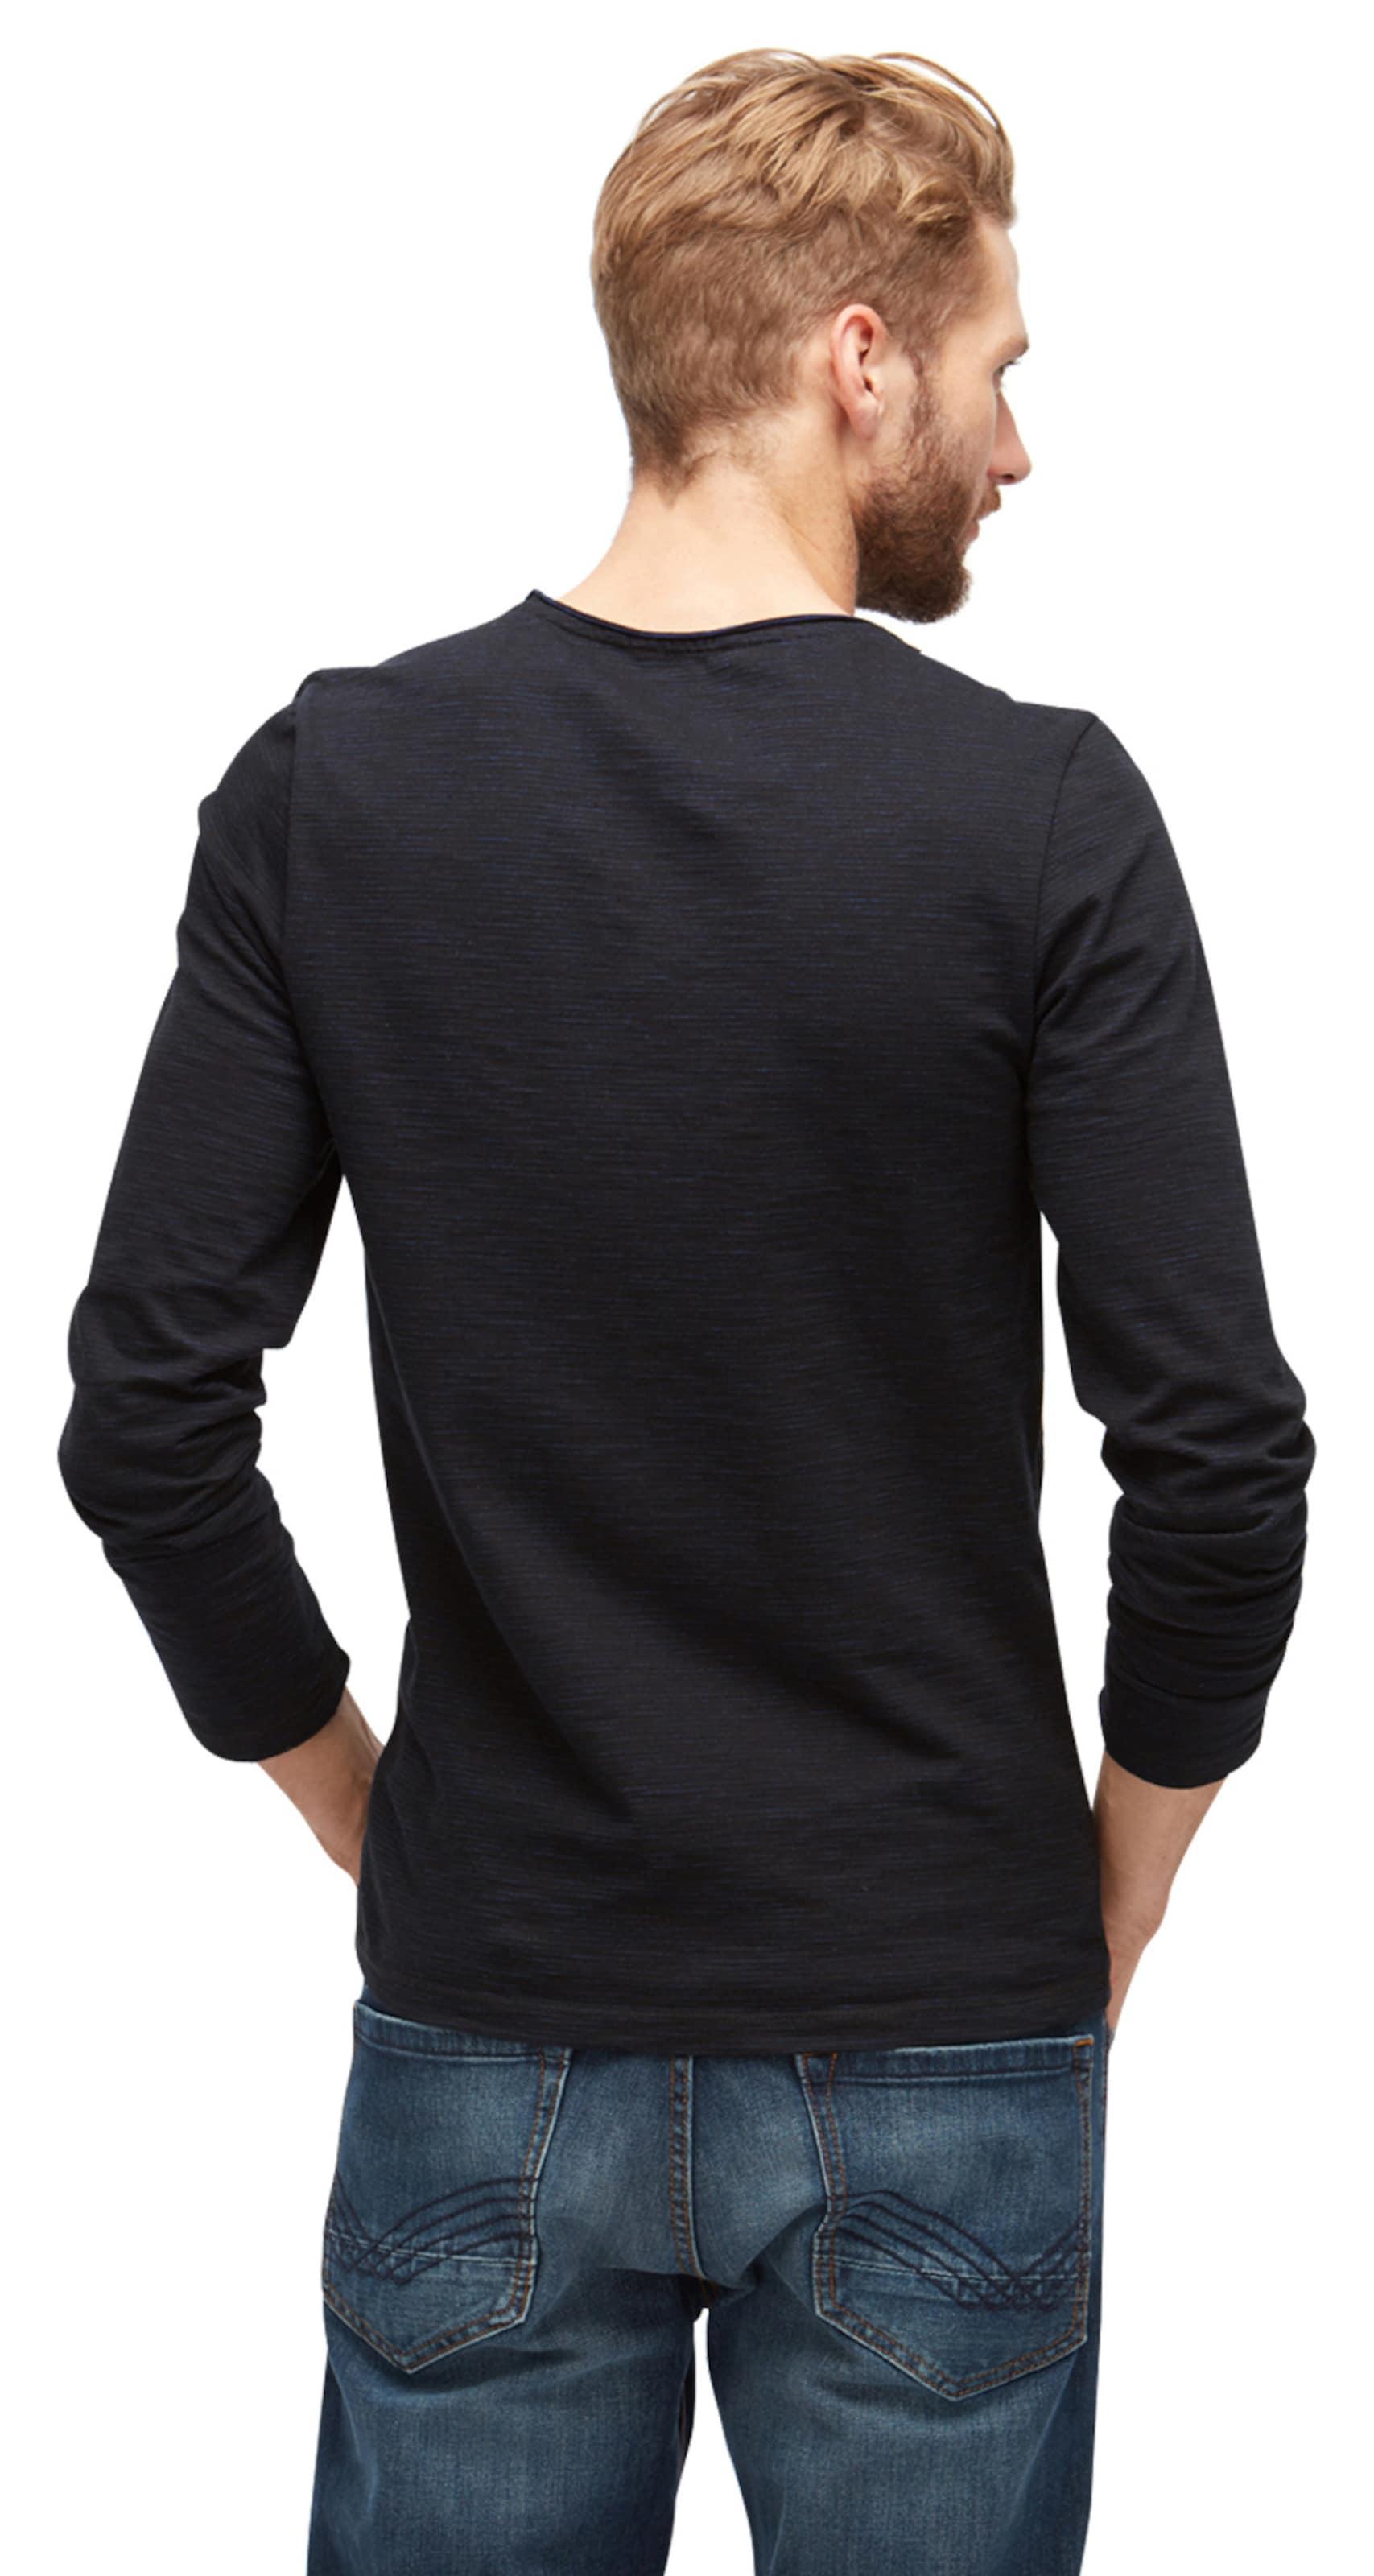 TOM TAILOR T-Shirt gestreiftes Langarmshirt Countdown-Paket Günstig Online Billig Größte Lieferant Exew9MTuCk